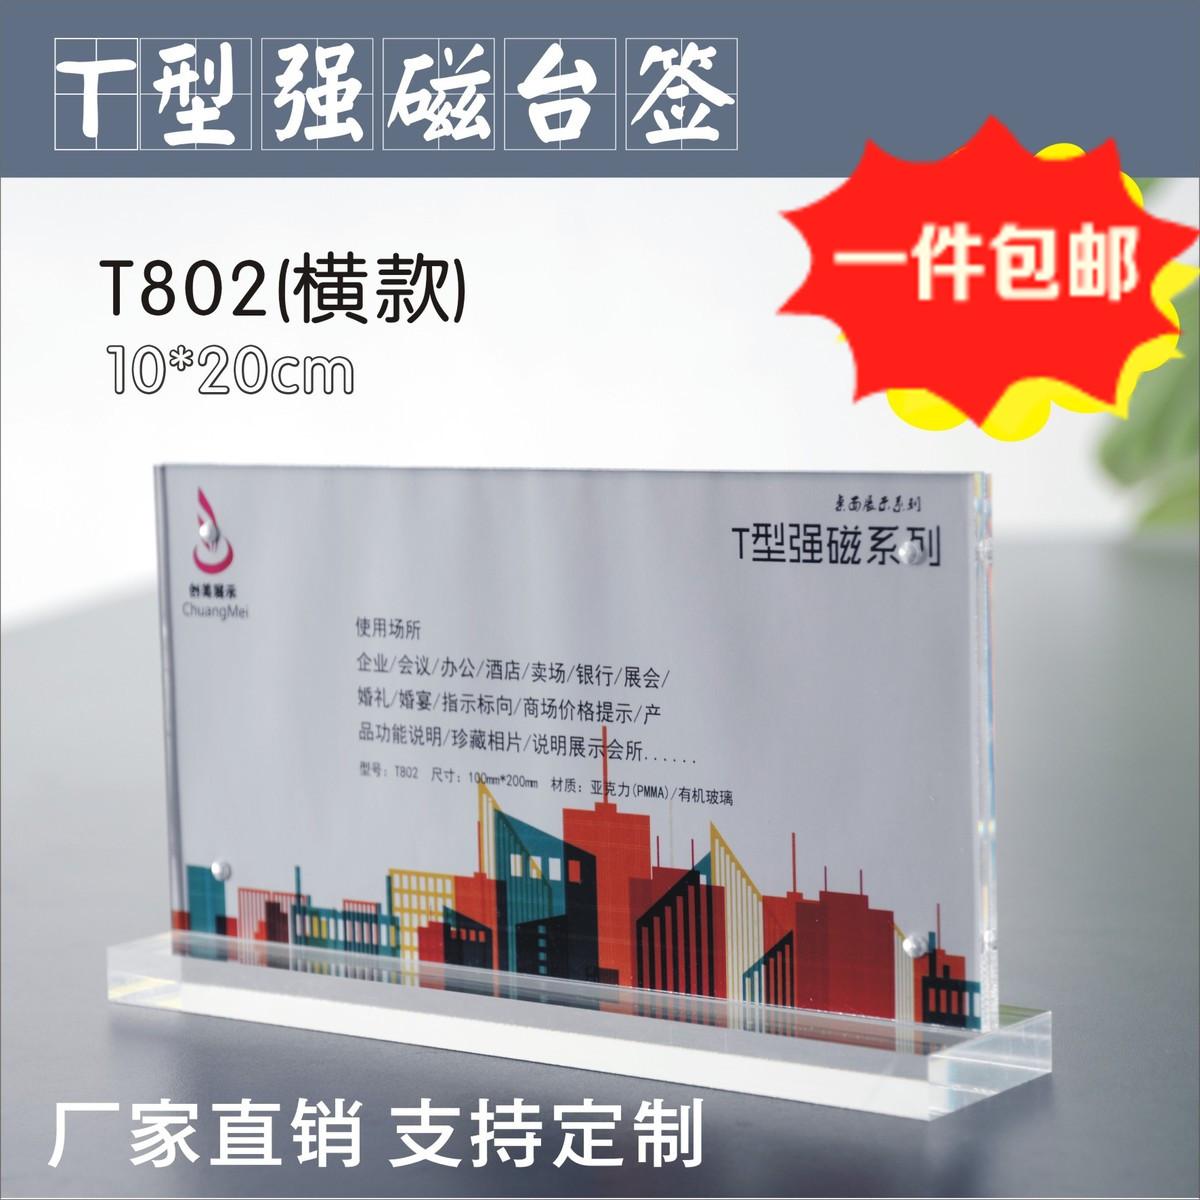 T802 магнитный табличный знак T-type card card table card интерьер Cress Taiwan Signature Display License Plate 10 * 20cm Log